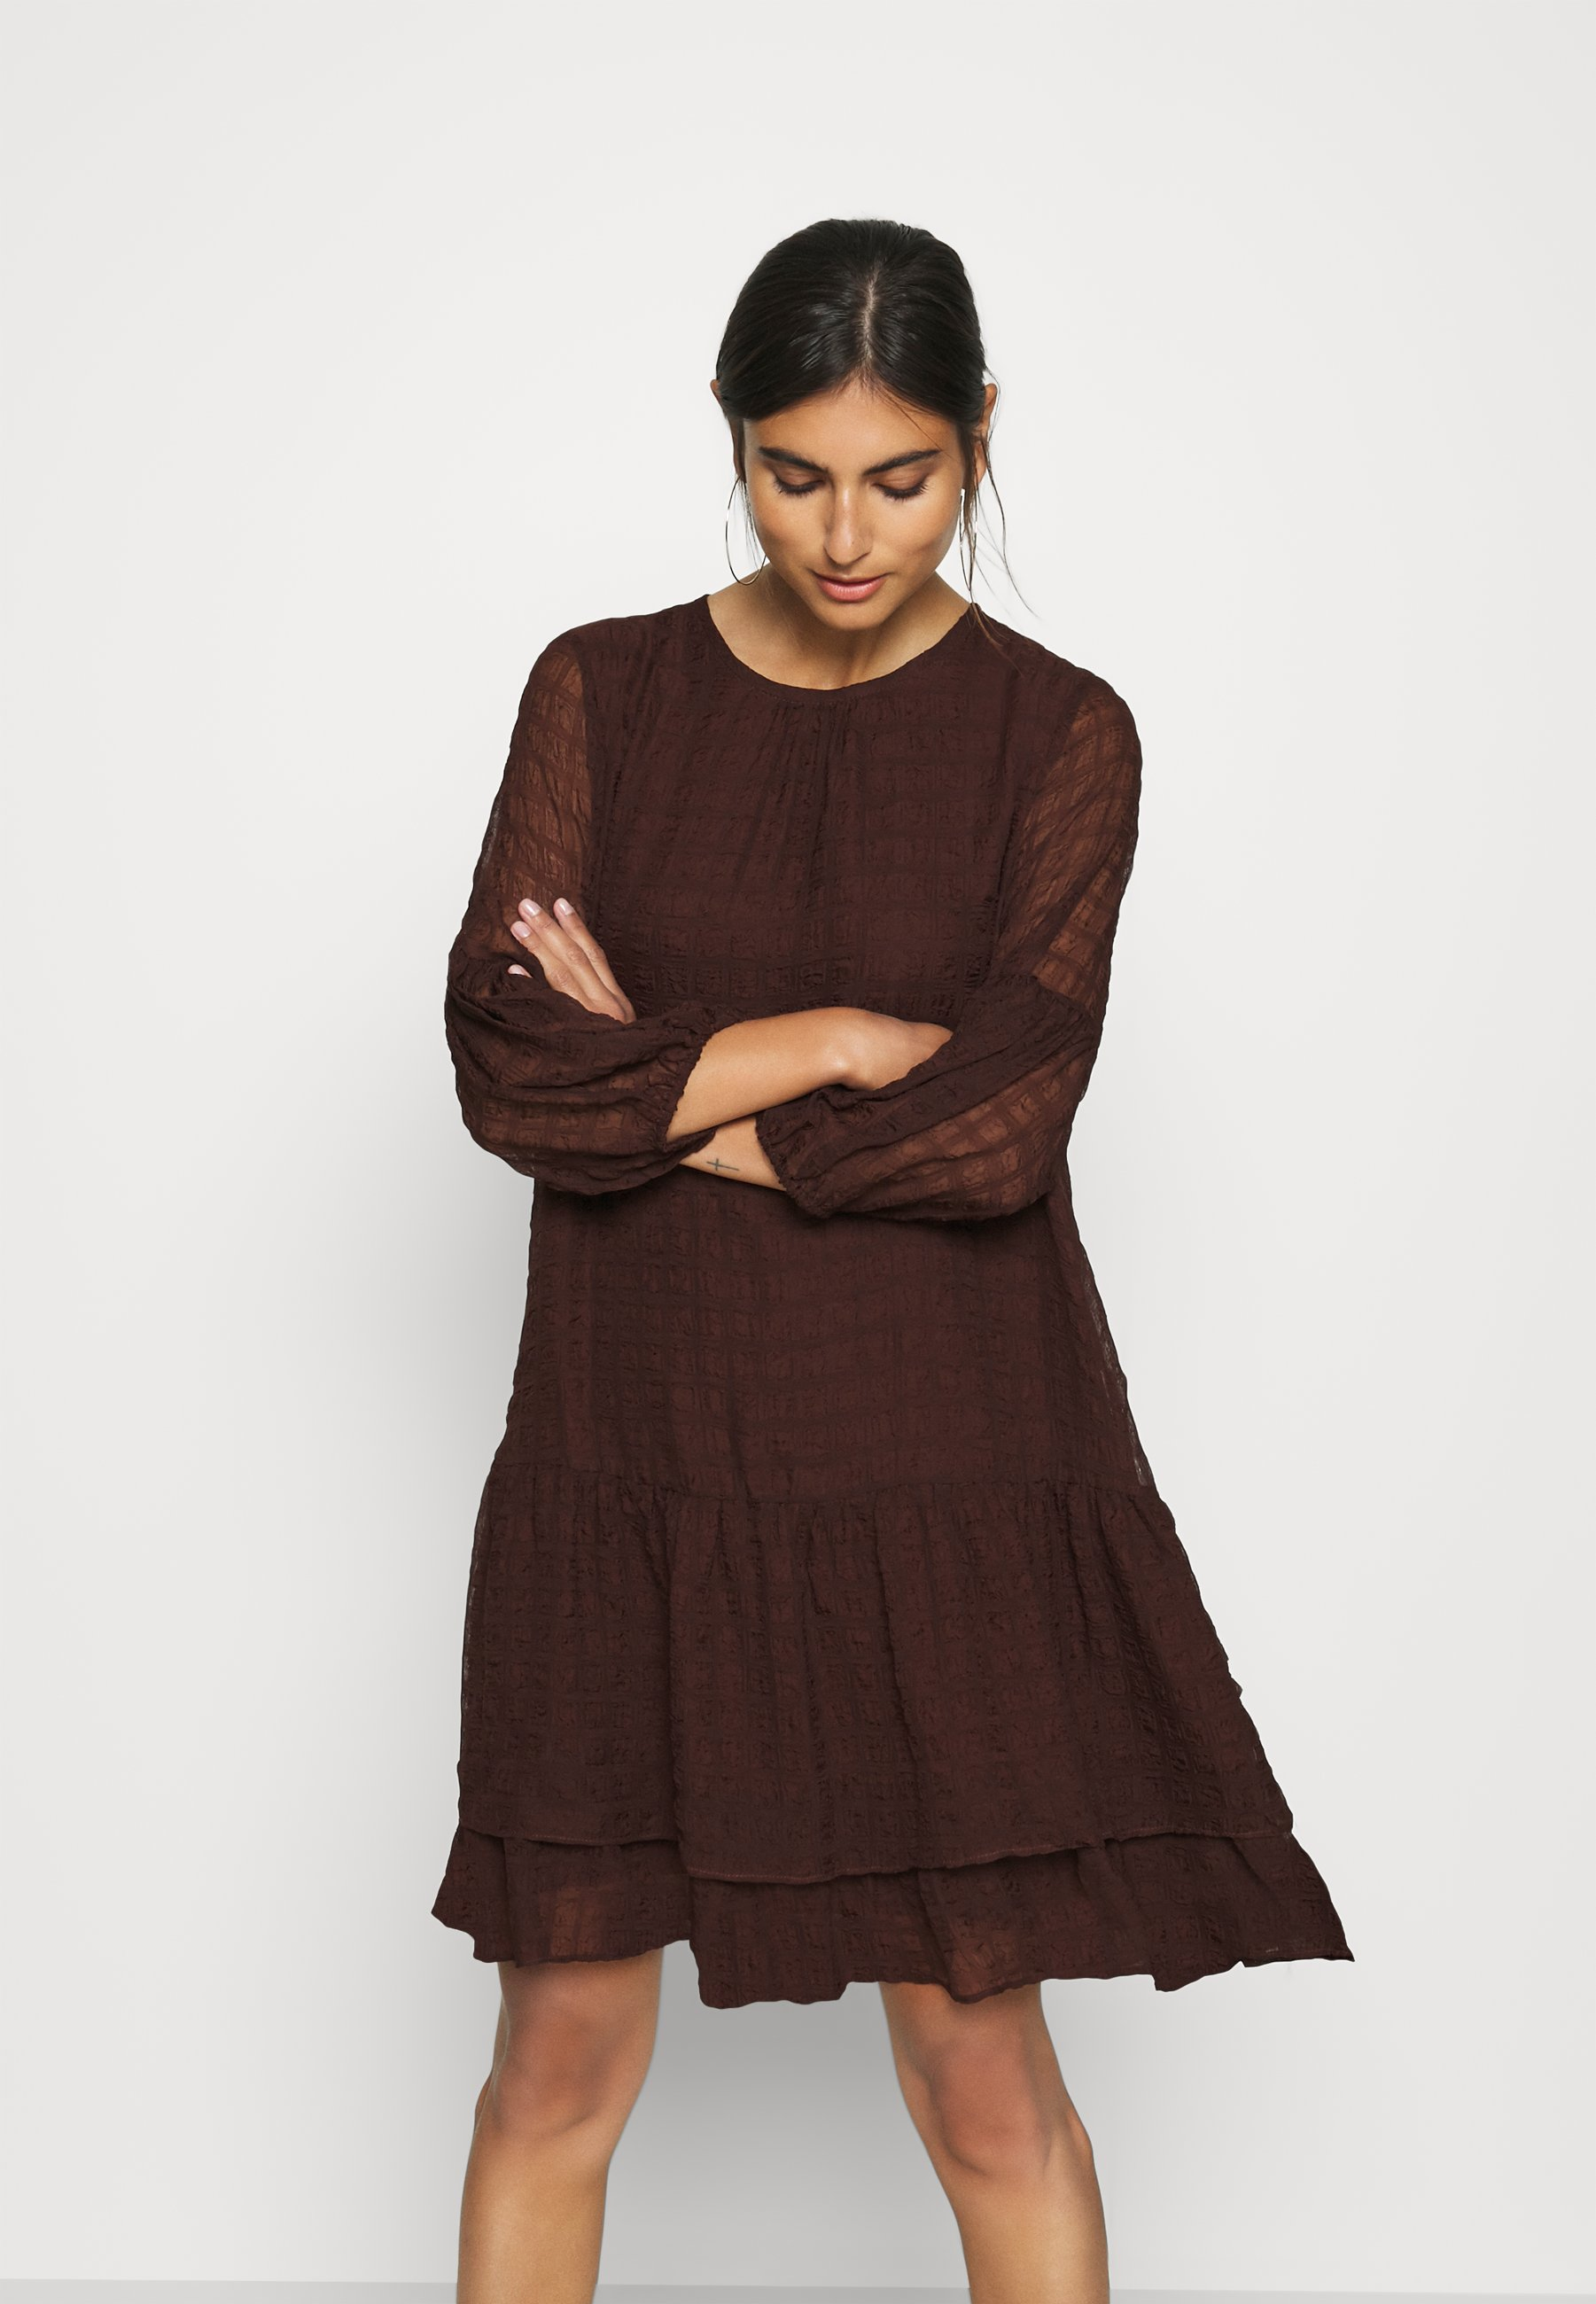 Factory Price Great Deals Women's Clothing InWear PAKWAIW DRESS Day dress coffee brown x9Il3StIi obNlAwHrQ